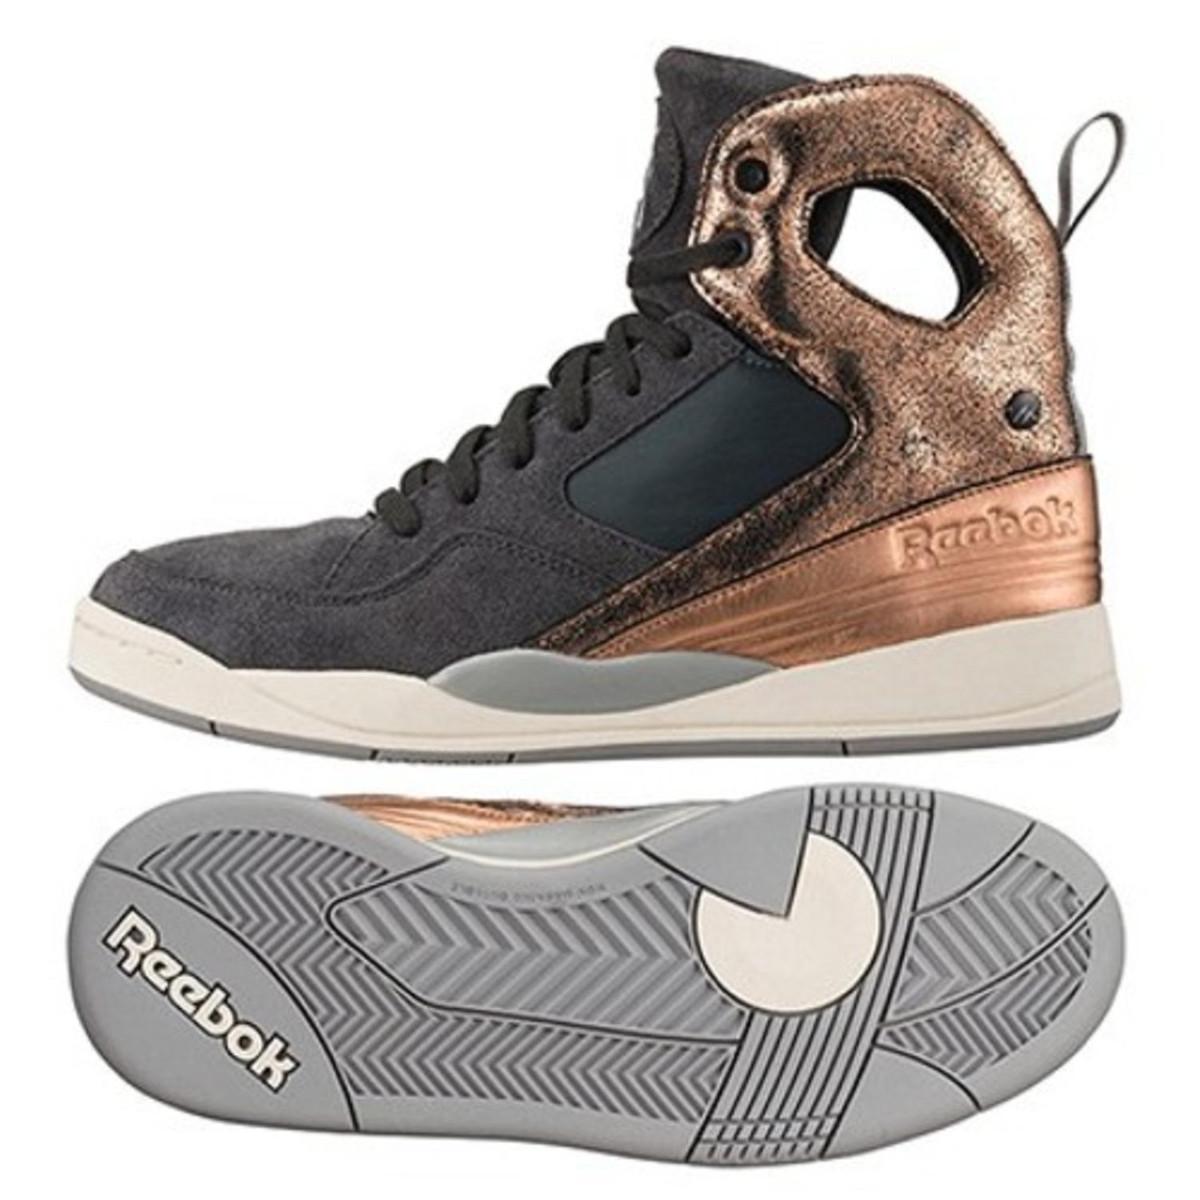 Reebok Damen Sneaker Schuhe Alicia Keys Court Gravel Rose Gold Sport Sneakers |